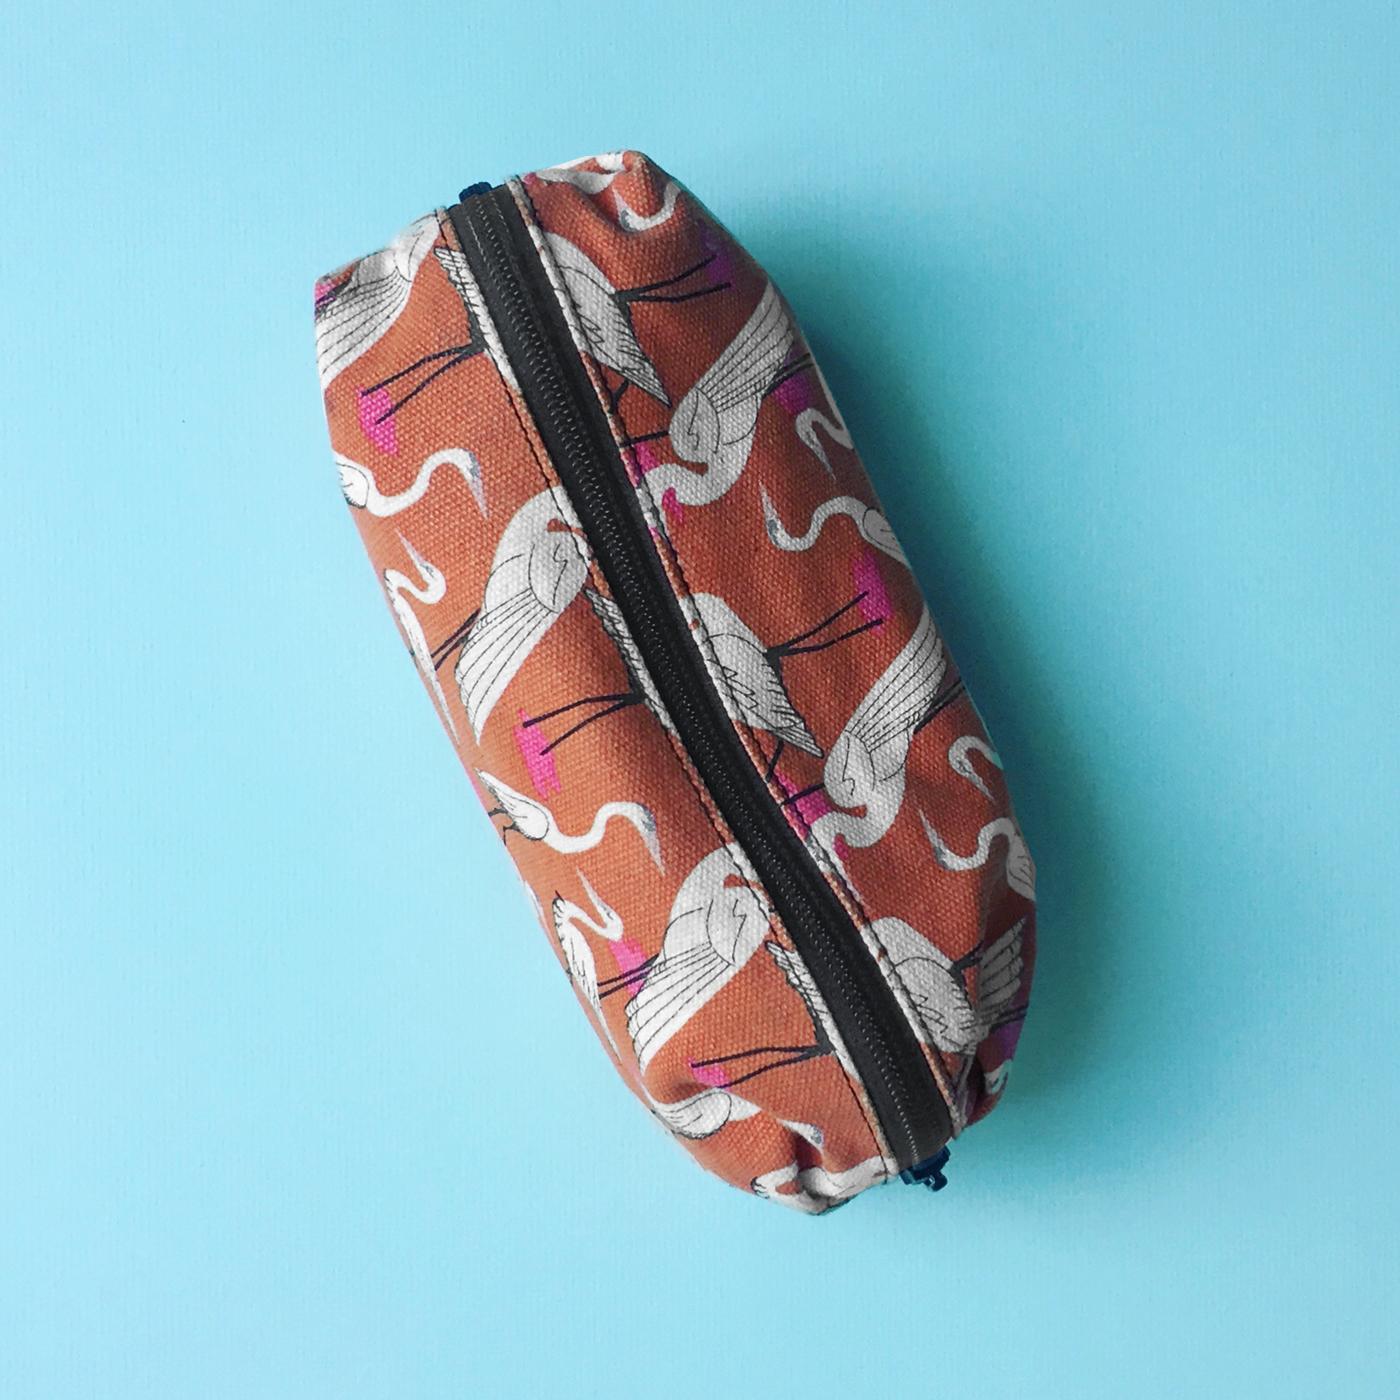 My favourite pencil case